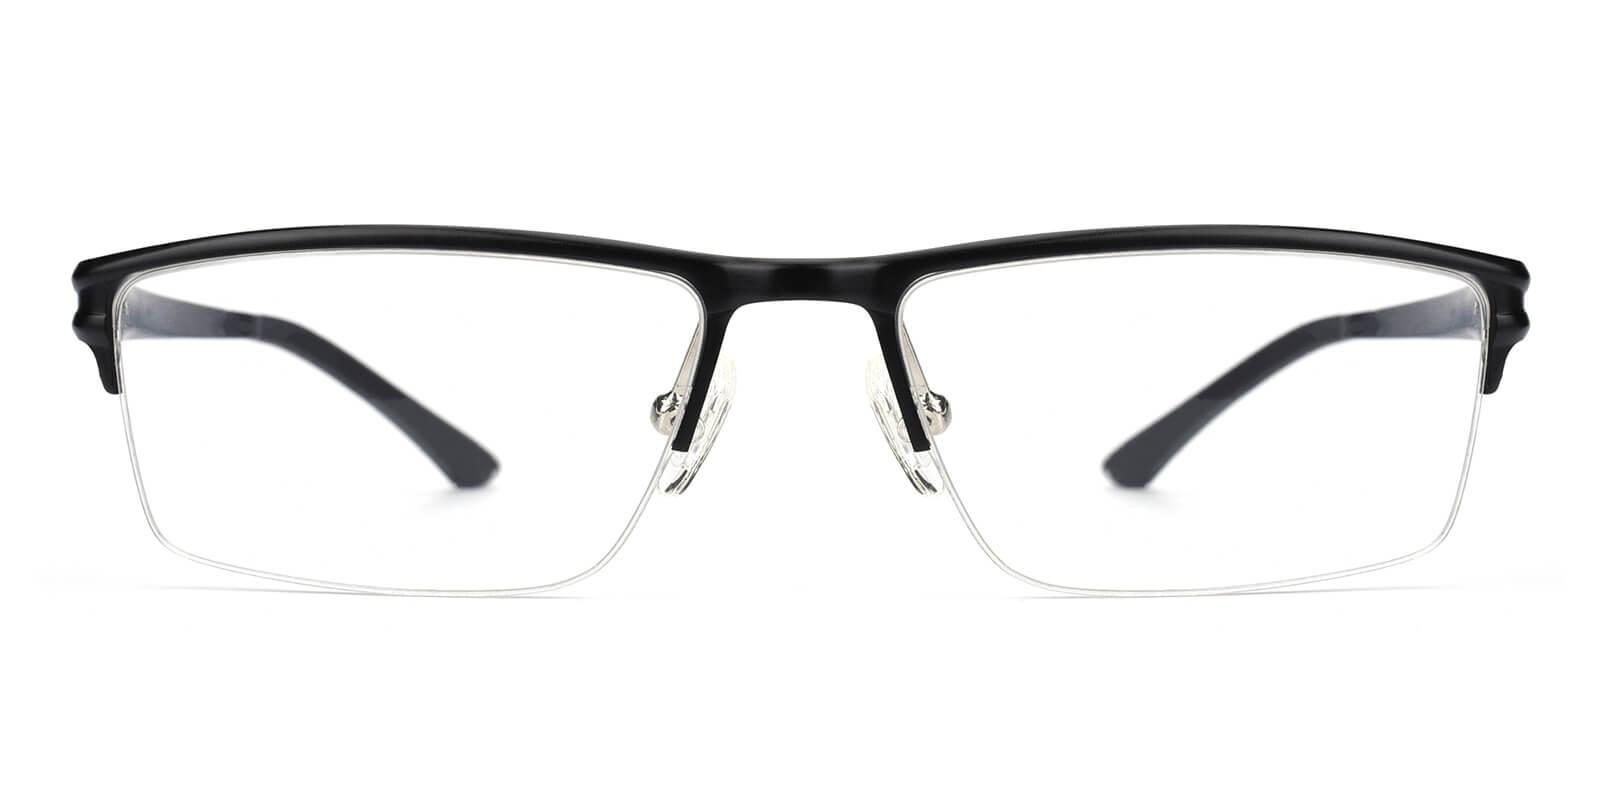 Leonado-Black-Rectangle-Metal-Eyeglasses-additional2